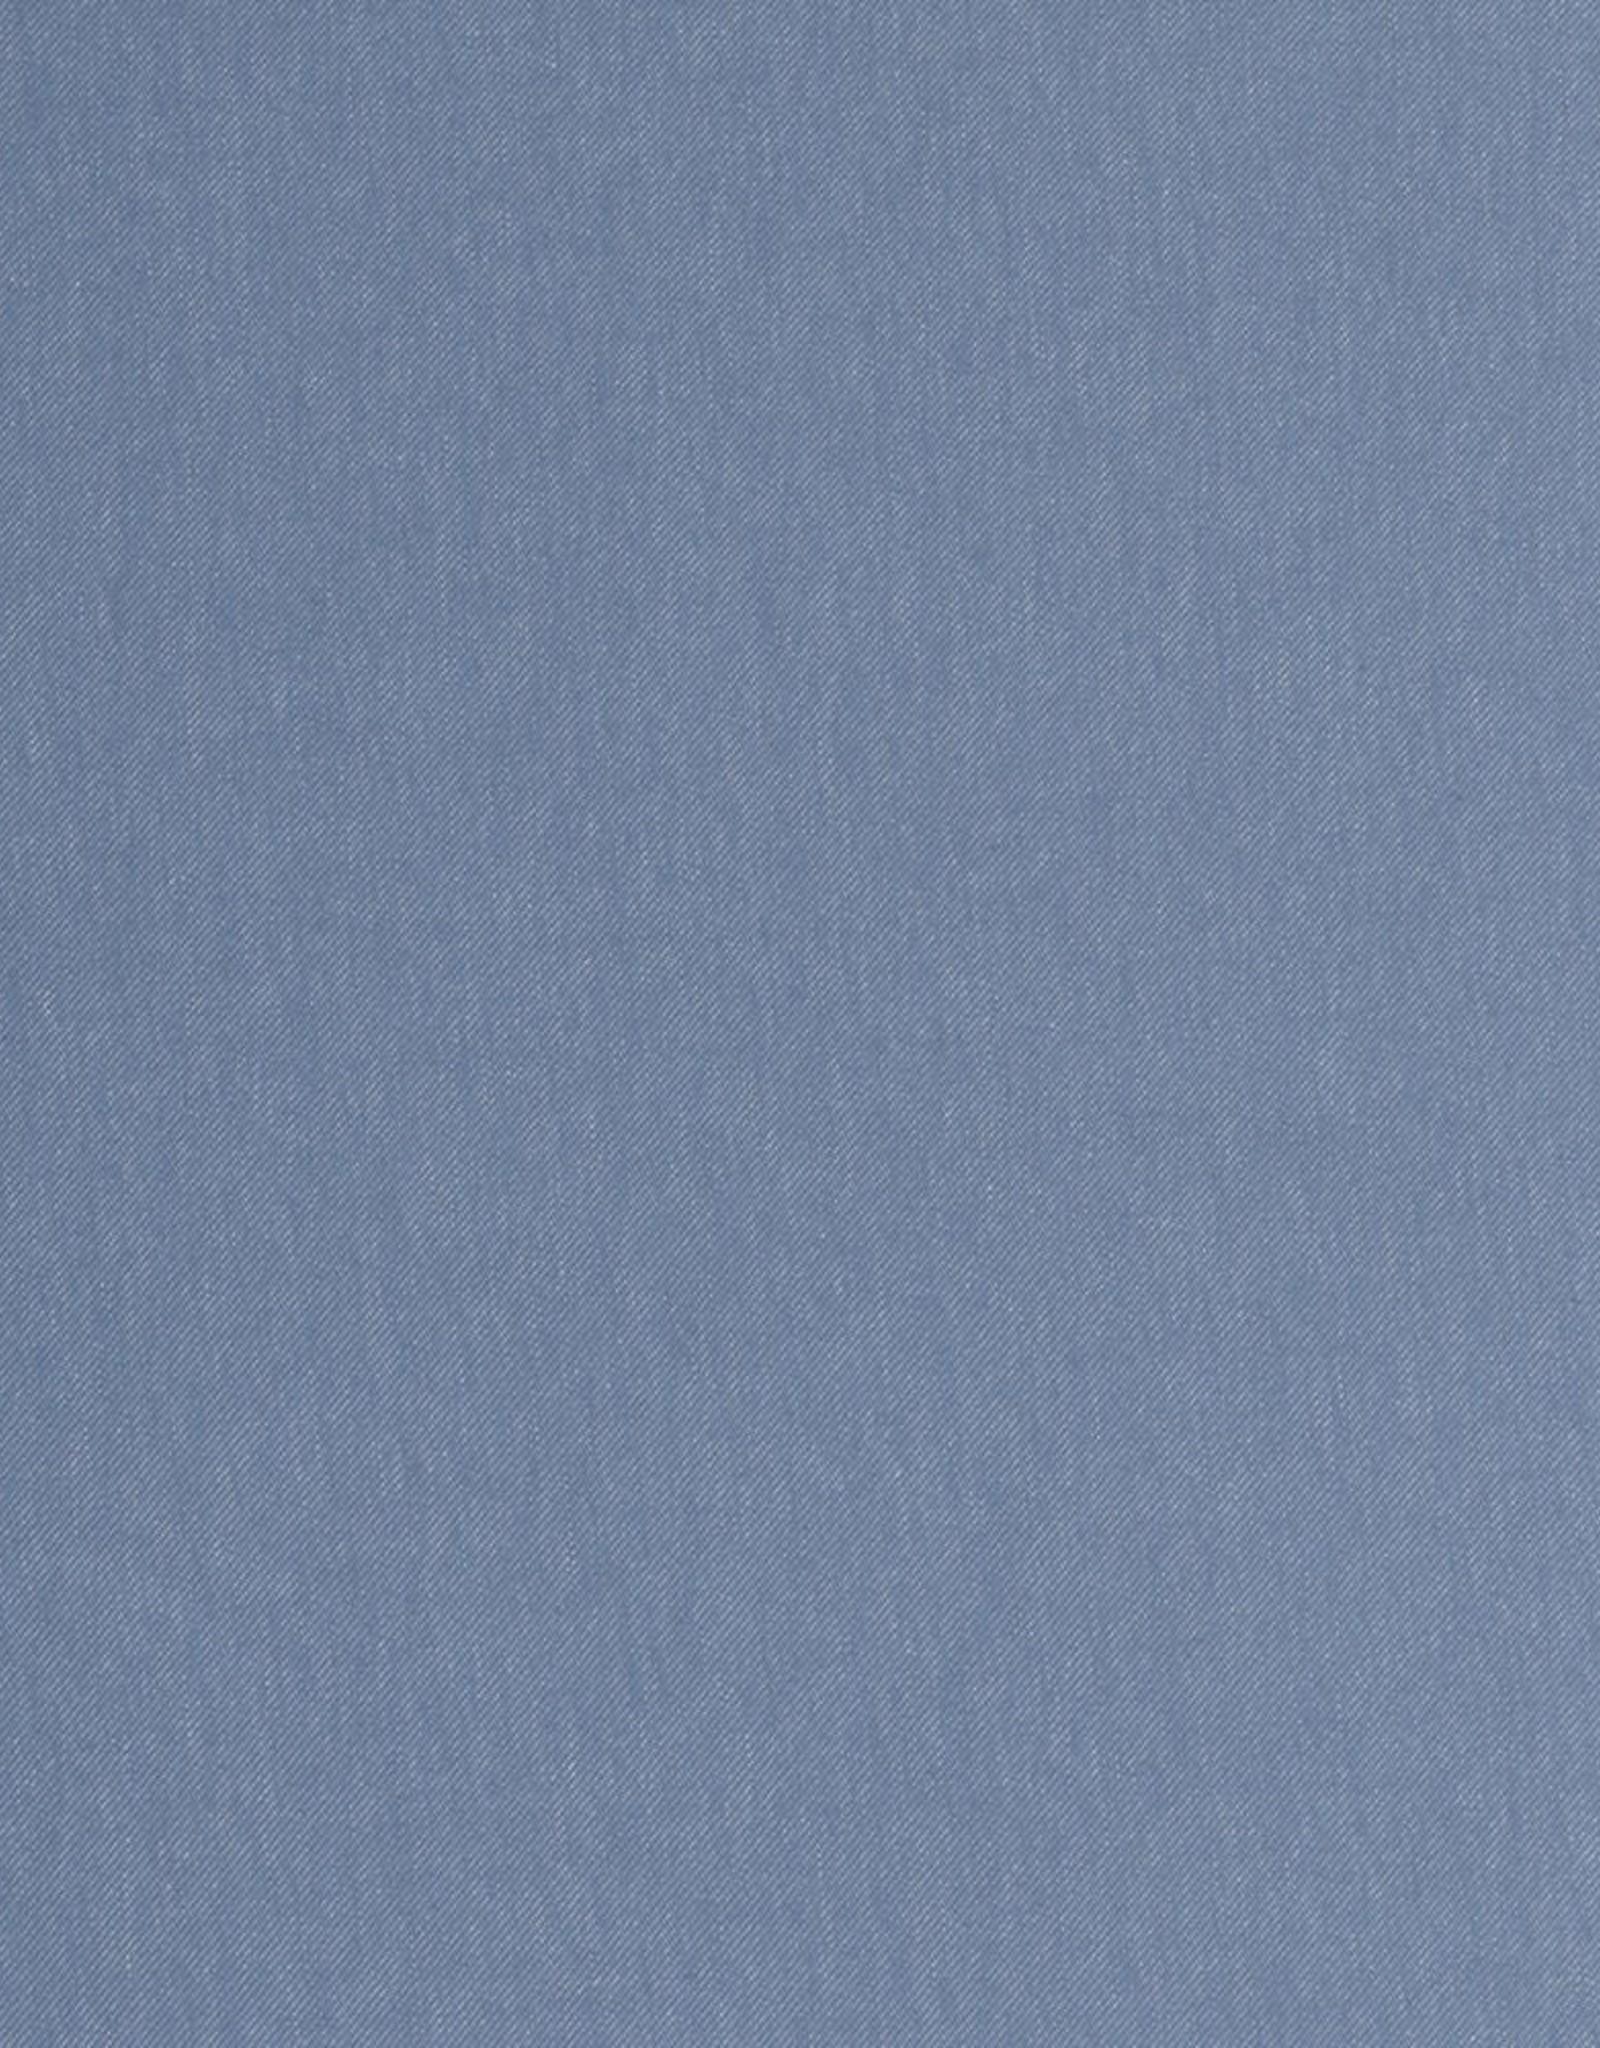 *Tricot katoen jeans licht blauw grijs